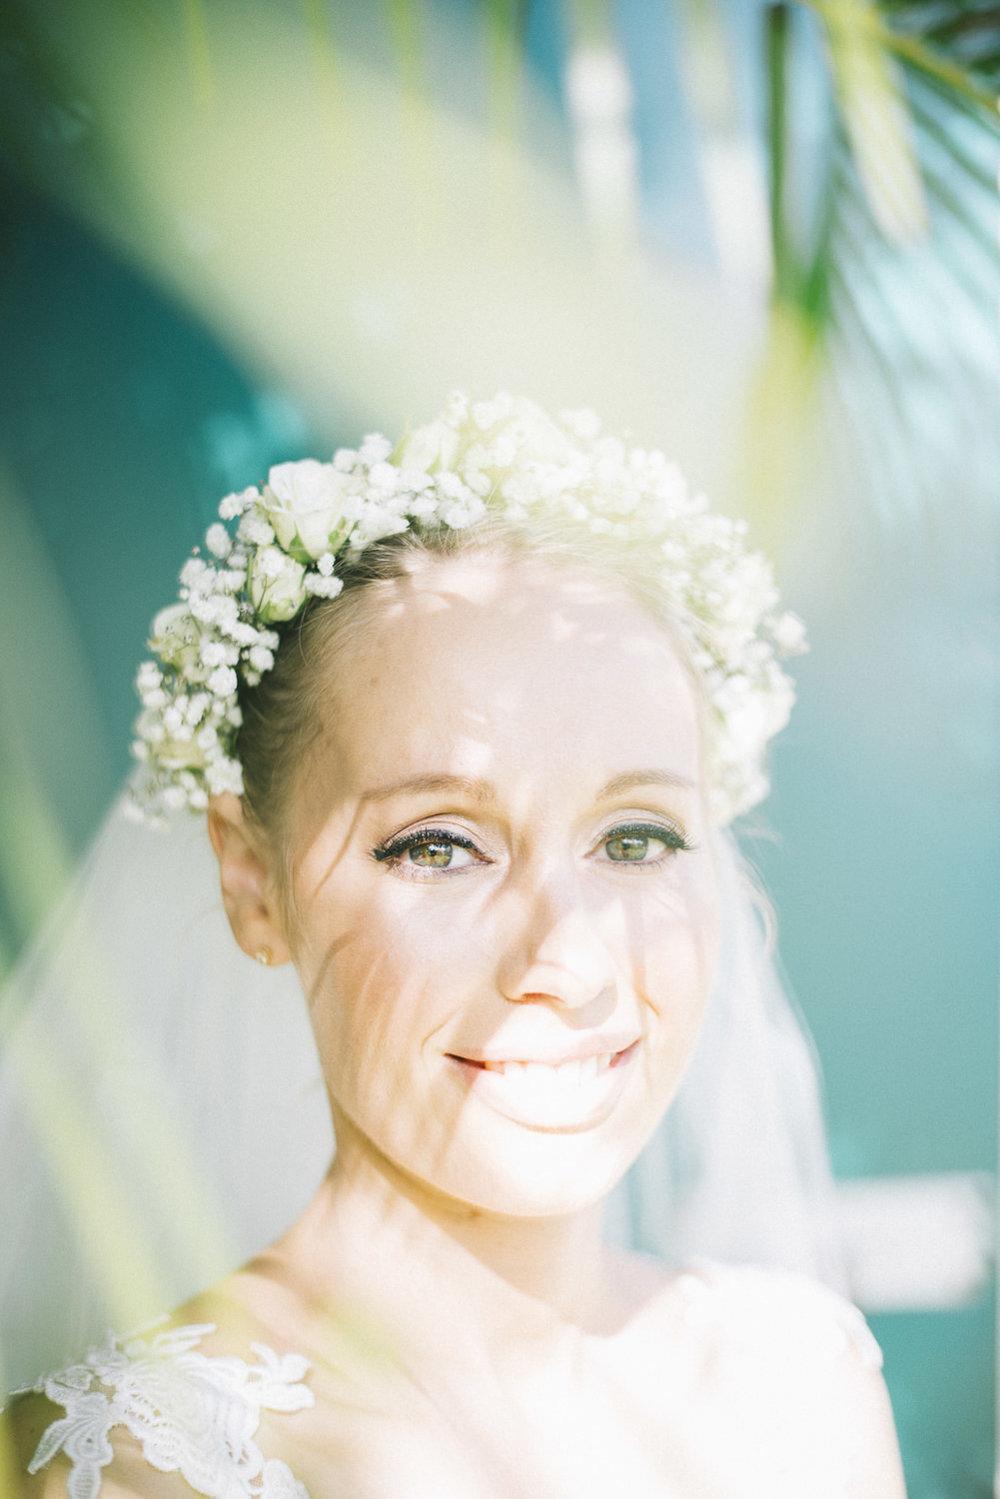 Ryan-sarah-jfk-wood-fire-gold-coast-wedding-45.jpg